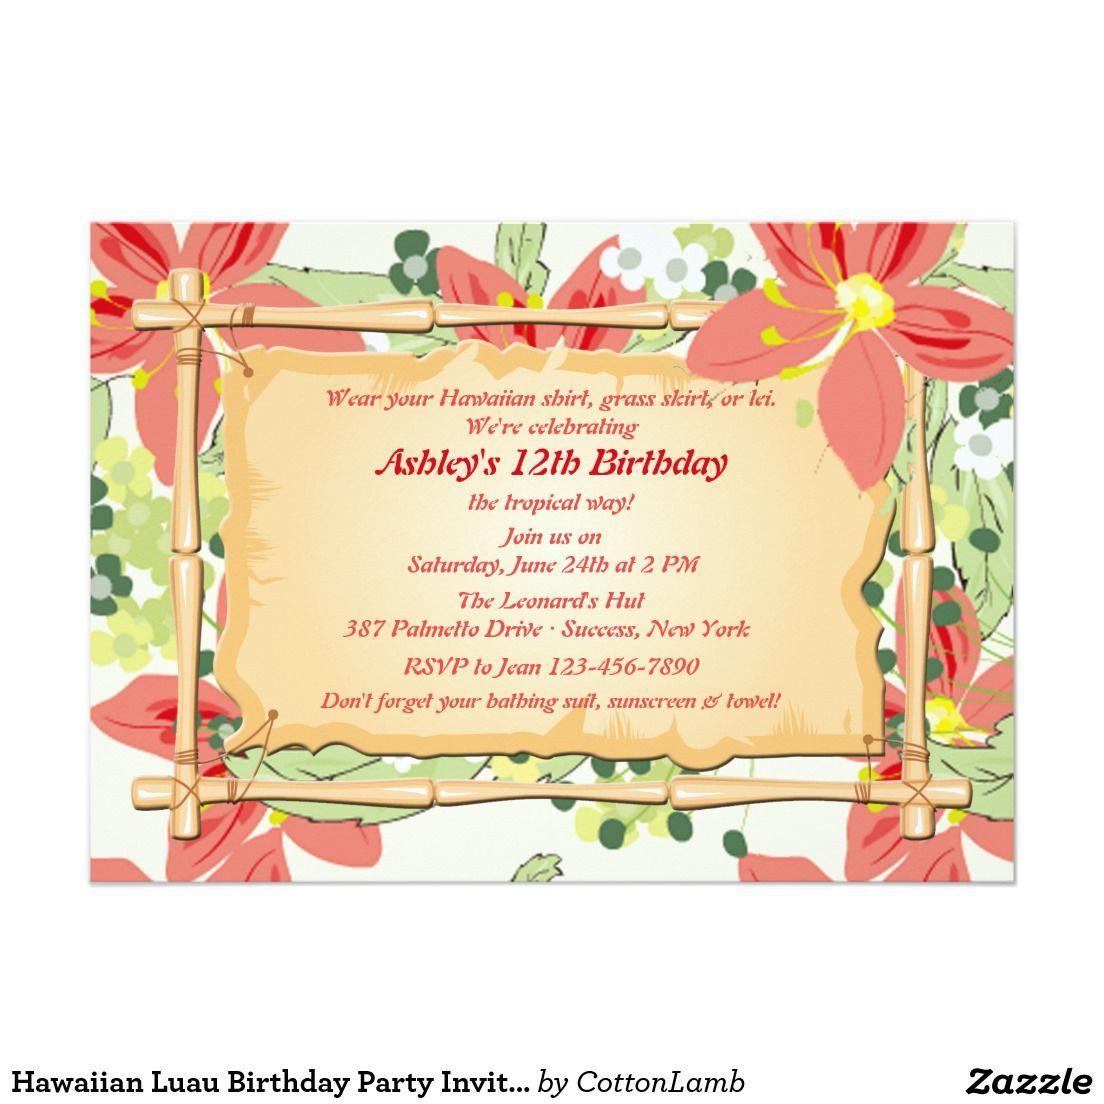 Luau Birthday Party Invitations